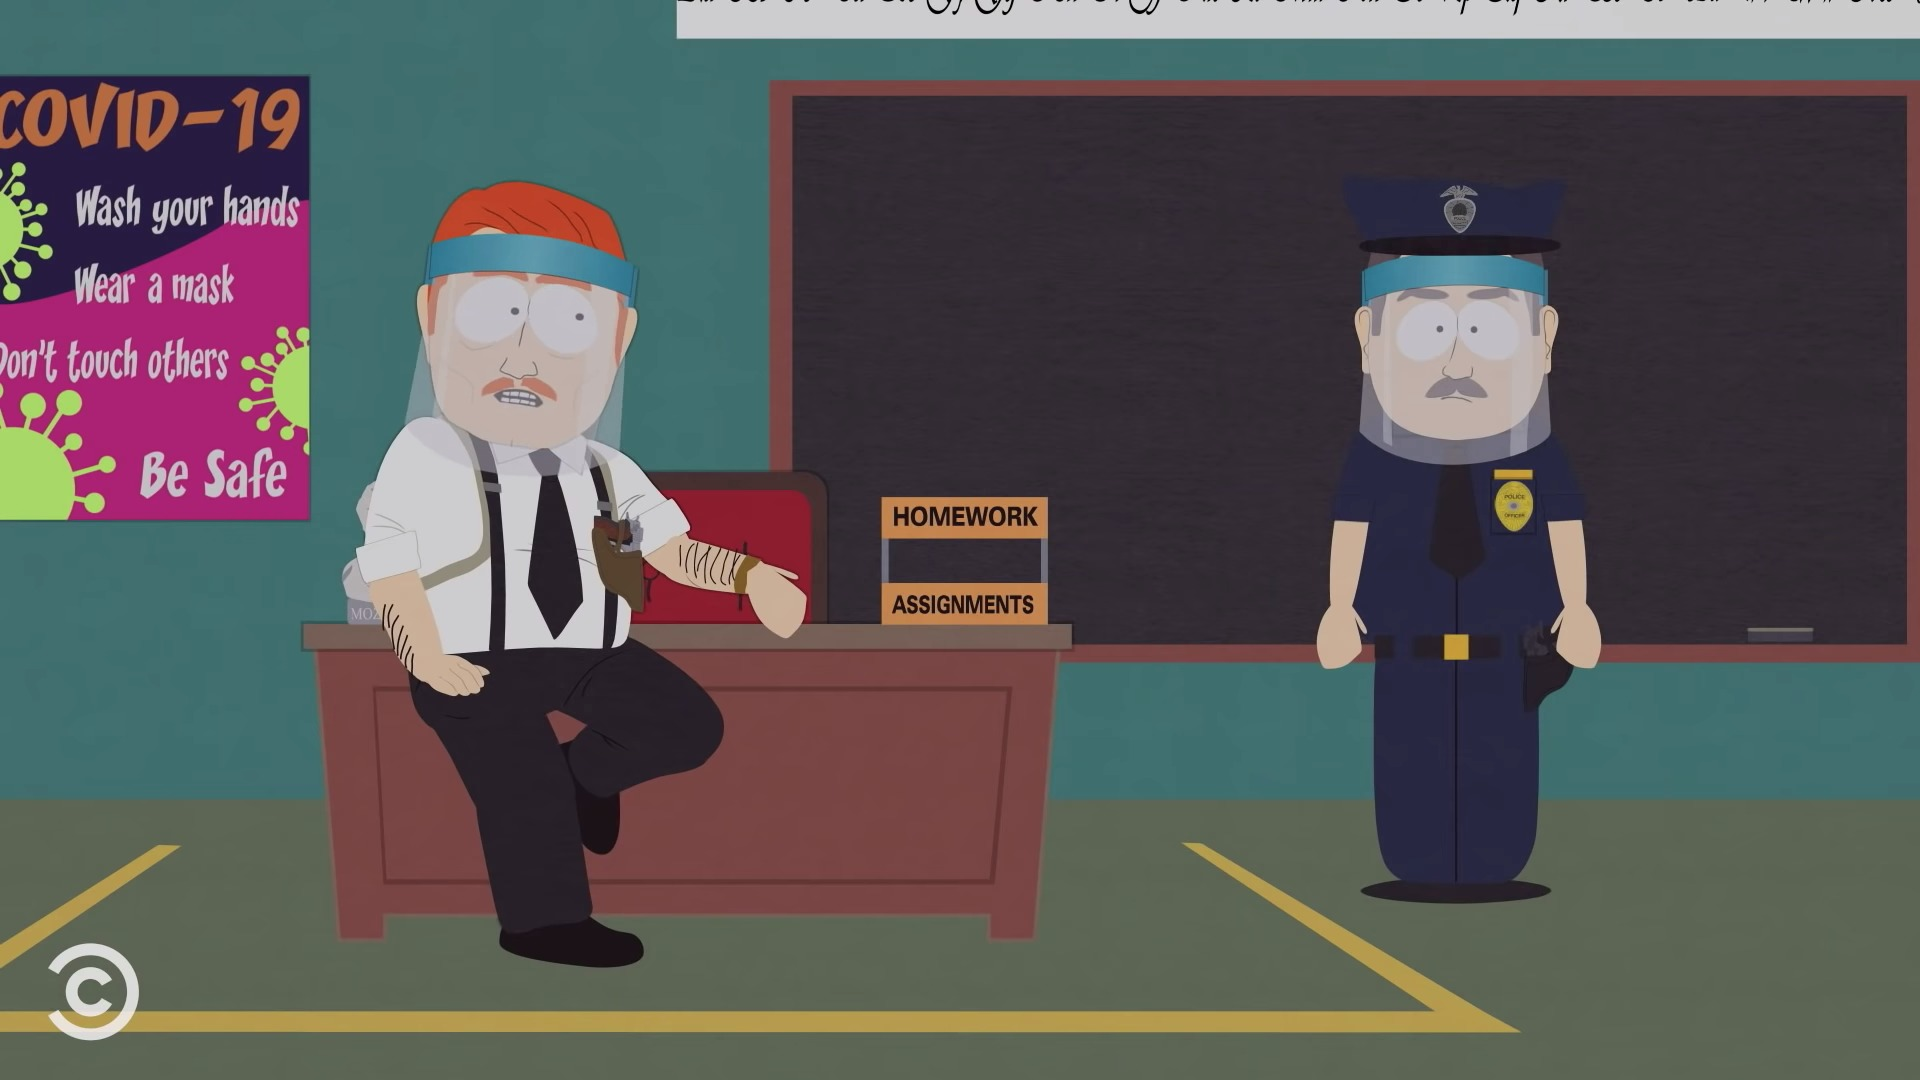 South Park coronavirus